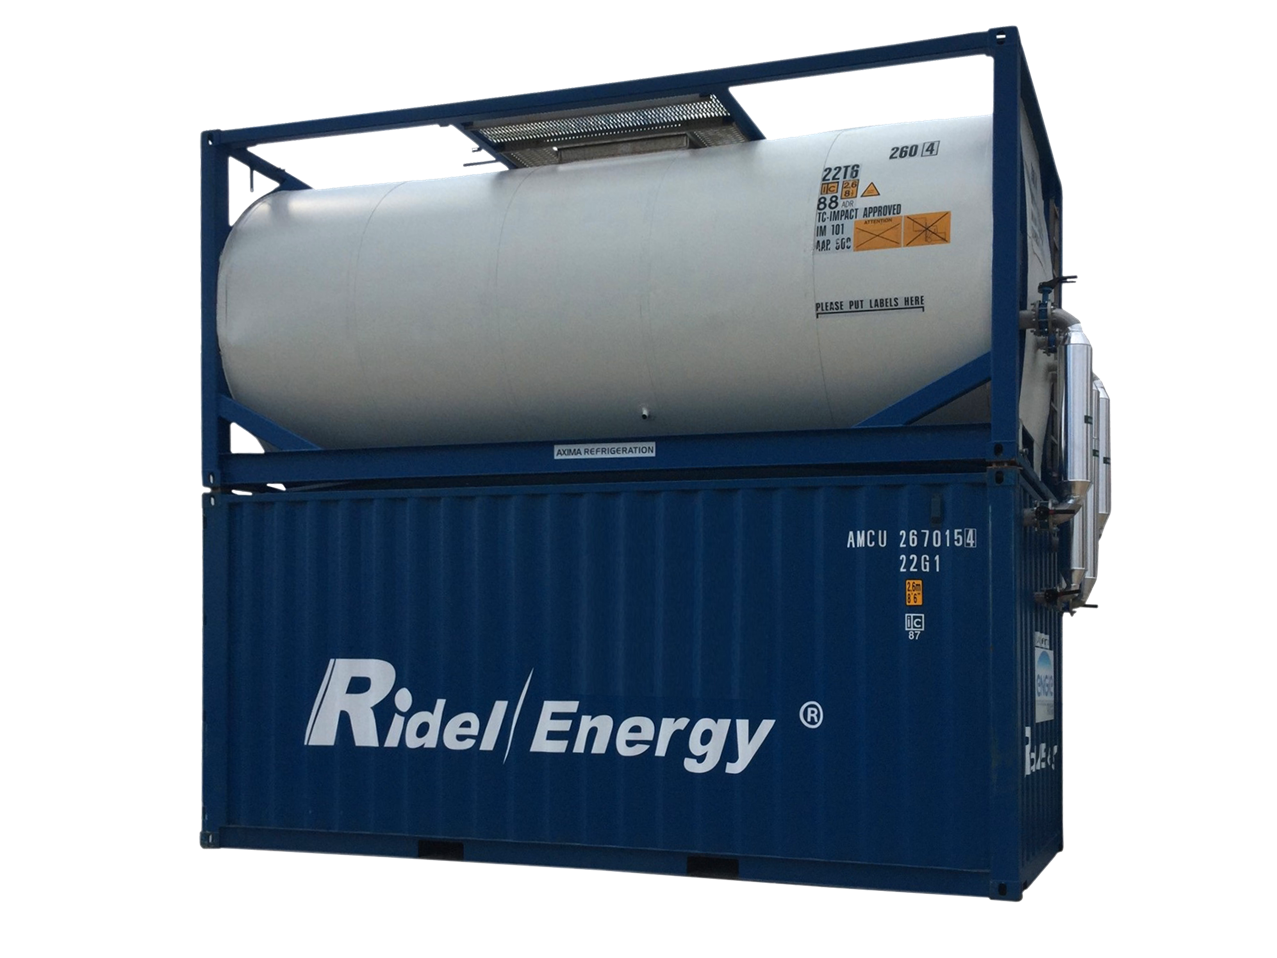 Industrial Refrigeration Heat recovery RidelCub